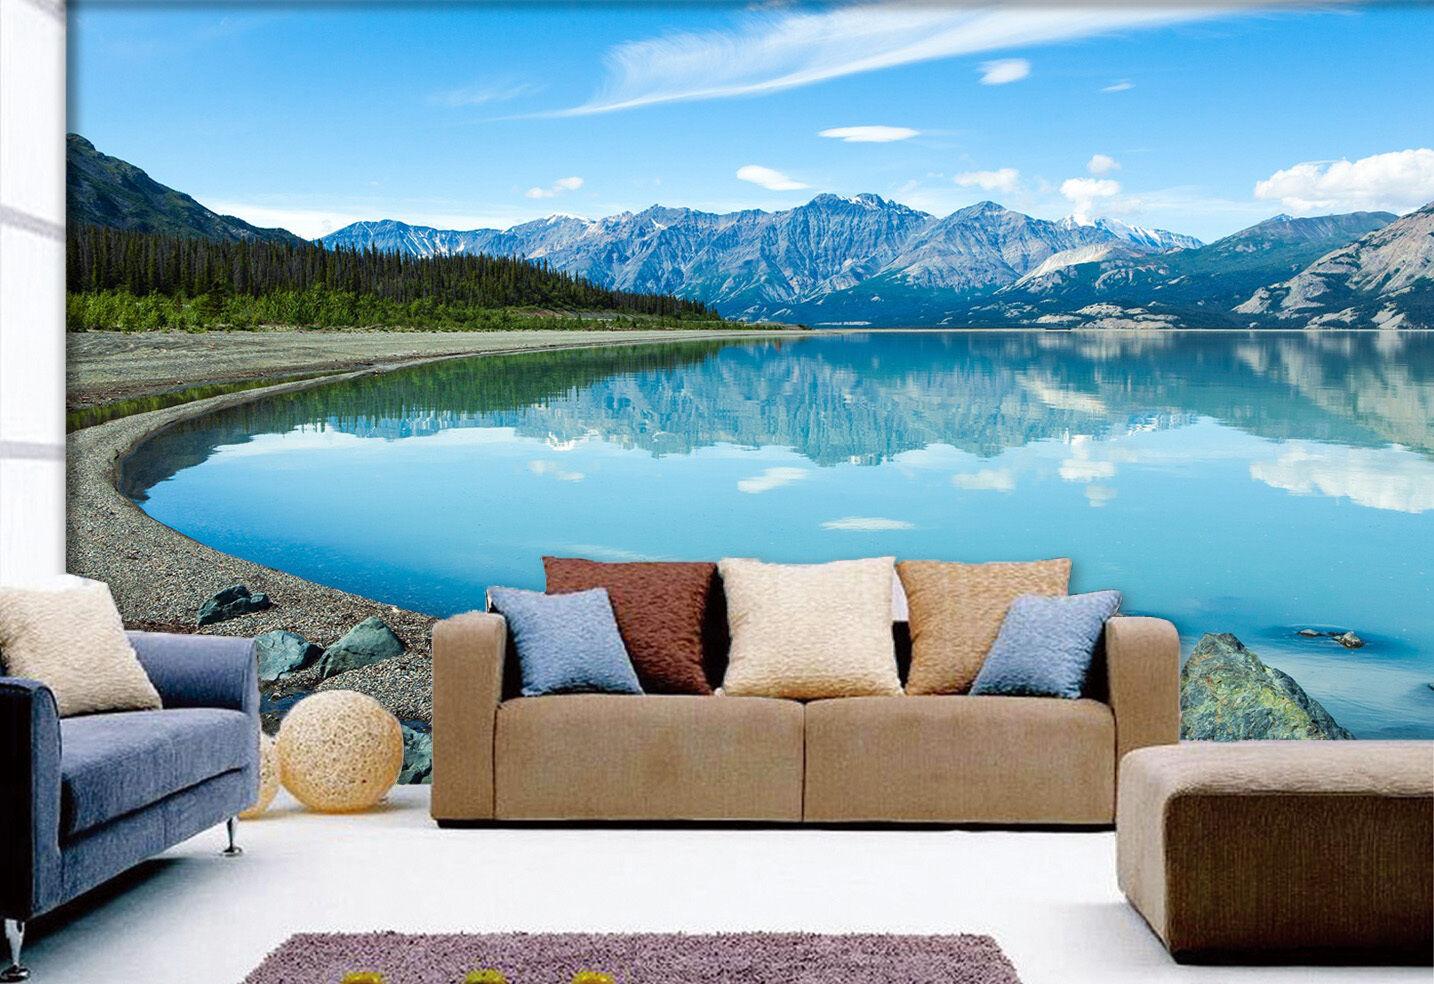 3D Peaceful Lake View 3314 Wallpaper Decal Dercor Home Kids Nursery Mural Home